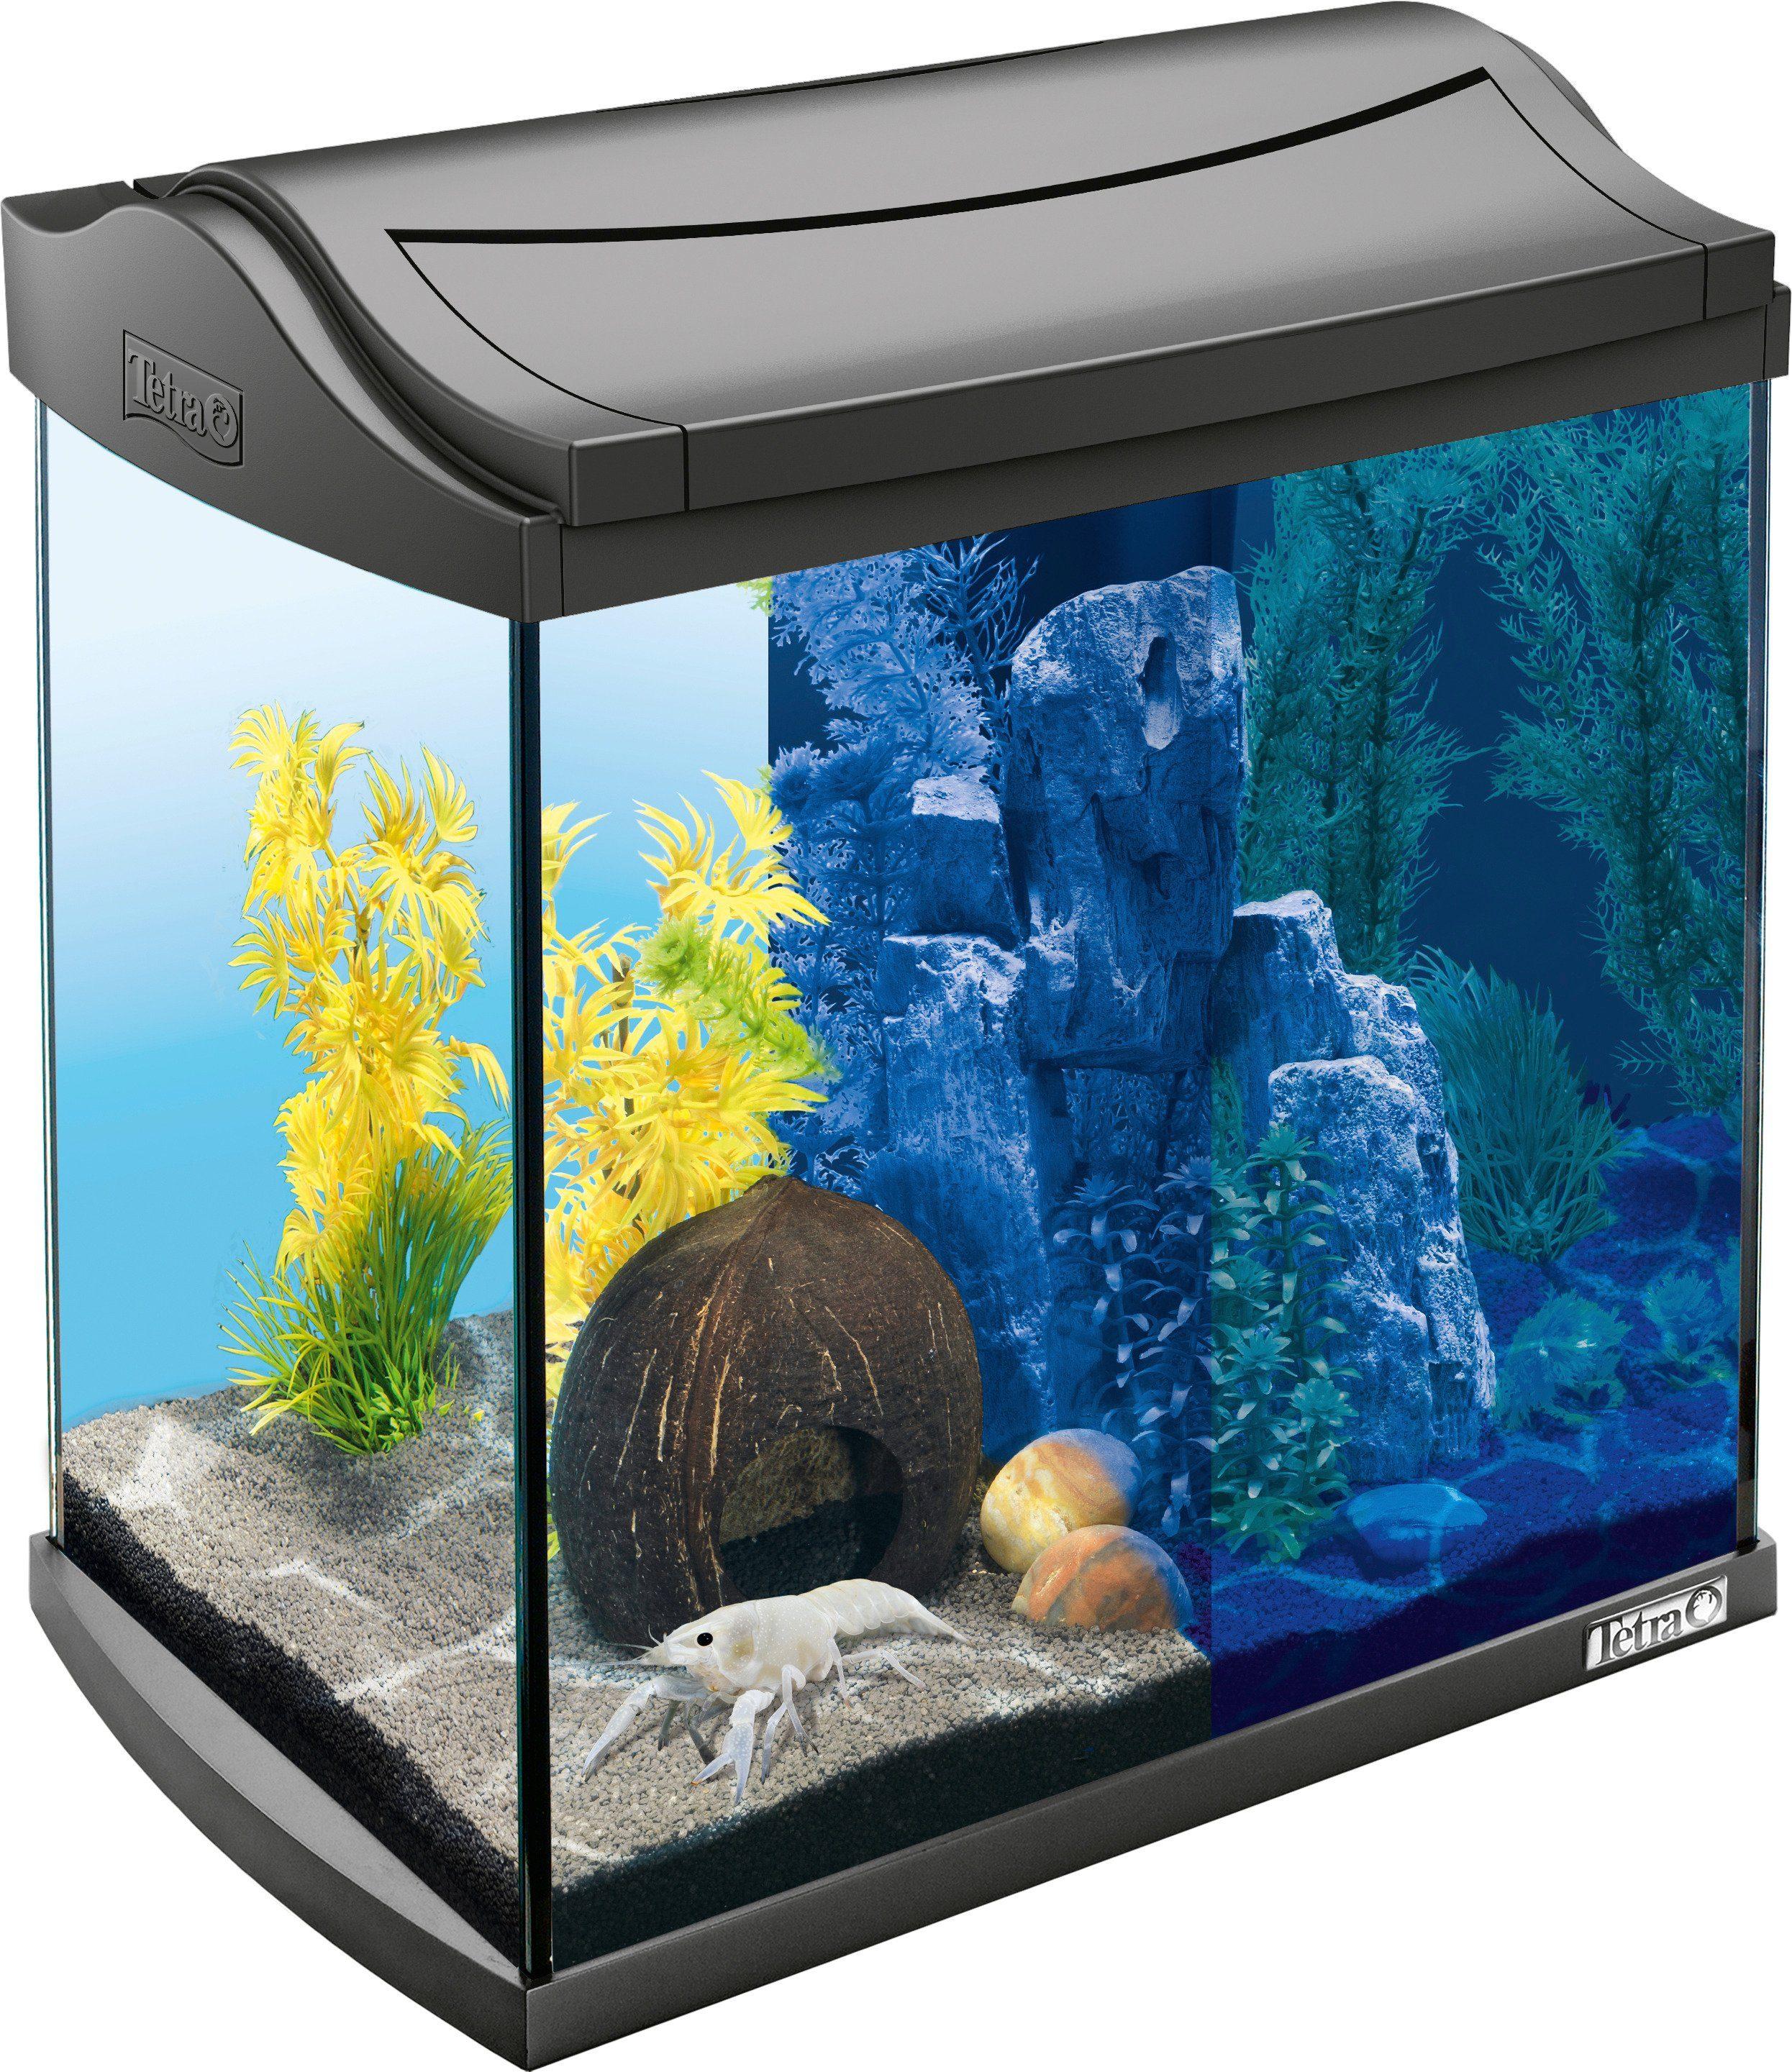 Tetra Aquarium »AquaArt LED Discovery Line« 30 l, anthrazit